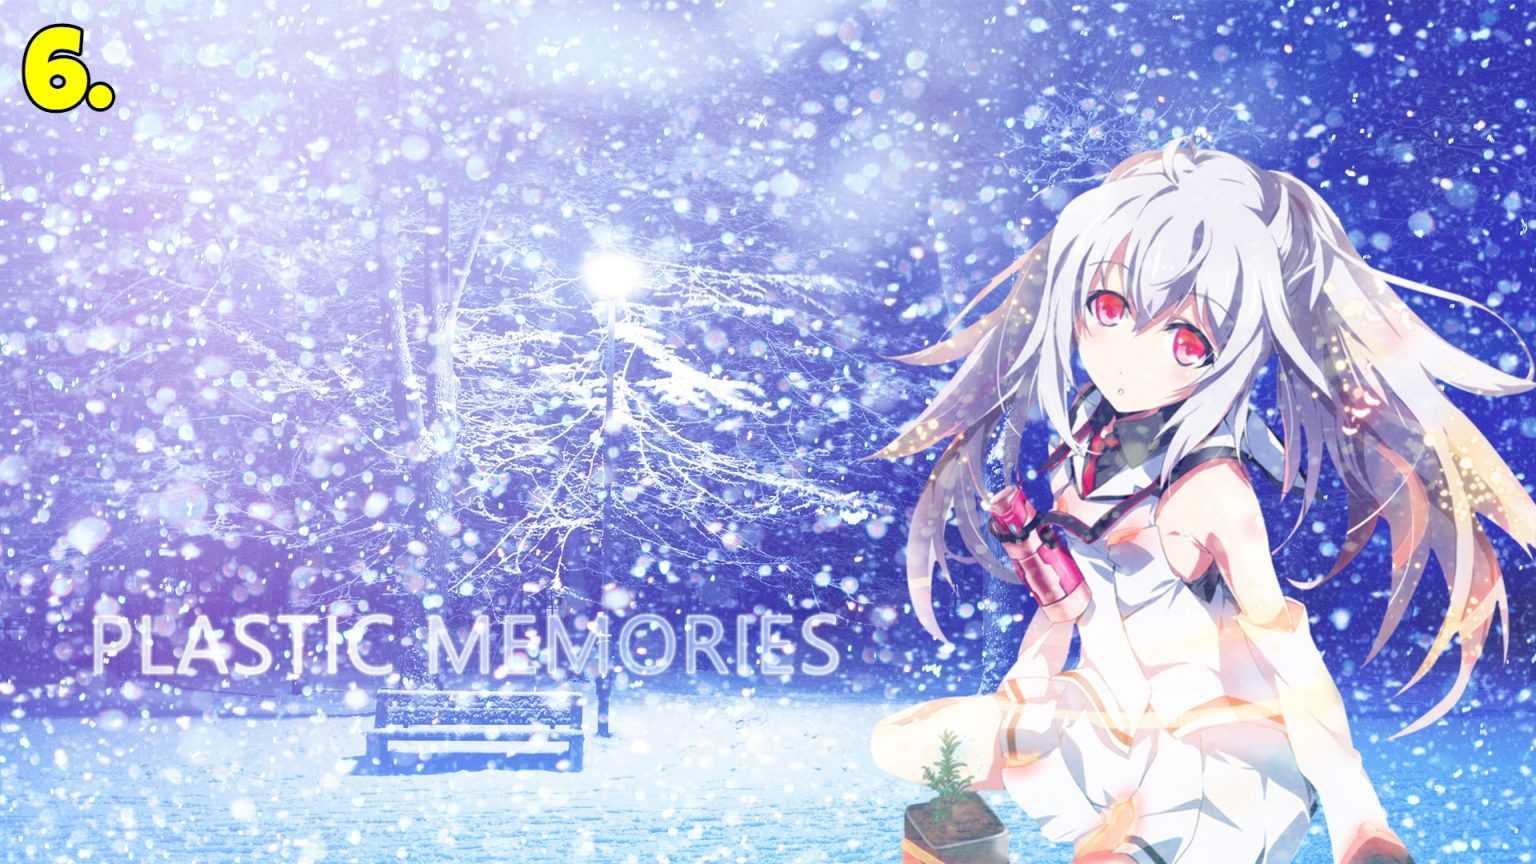 Plastic-Memories